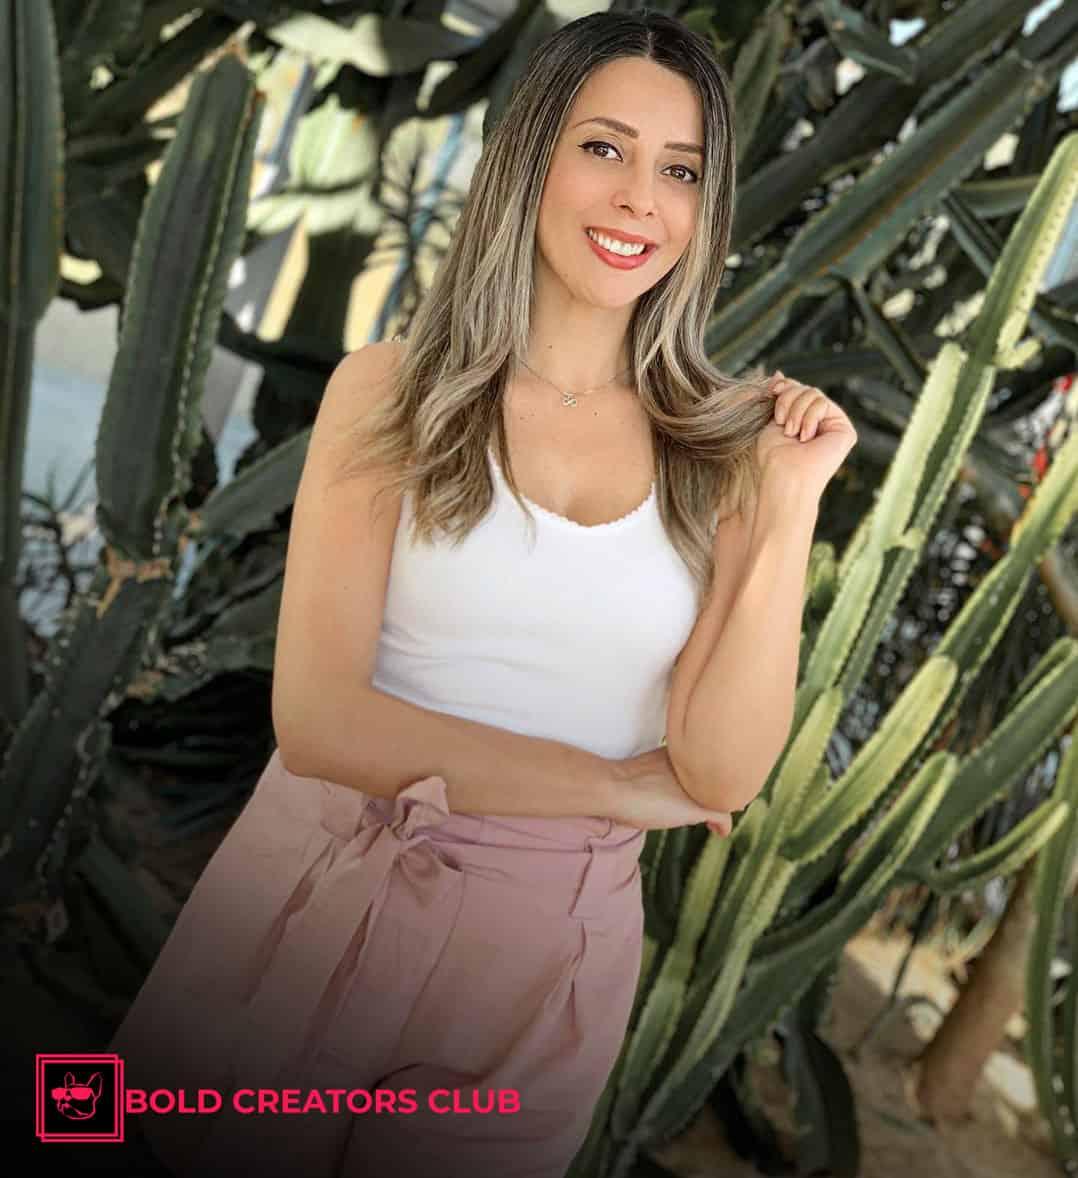 Thais Matsura Bold Creators Club Influencer Marketing Agency South America Brazil